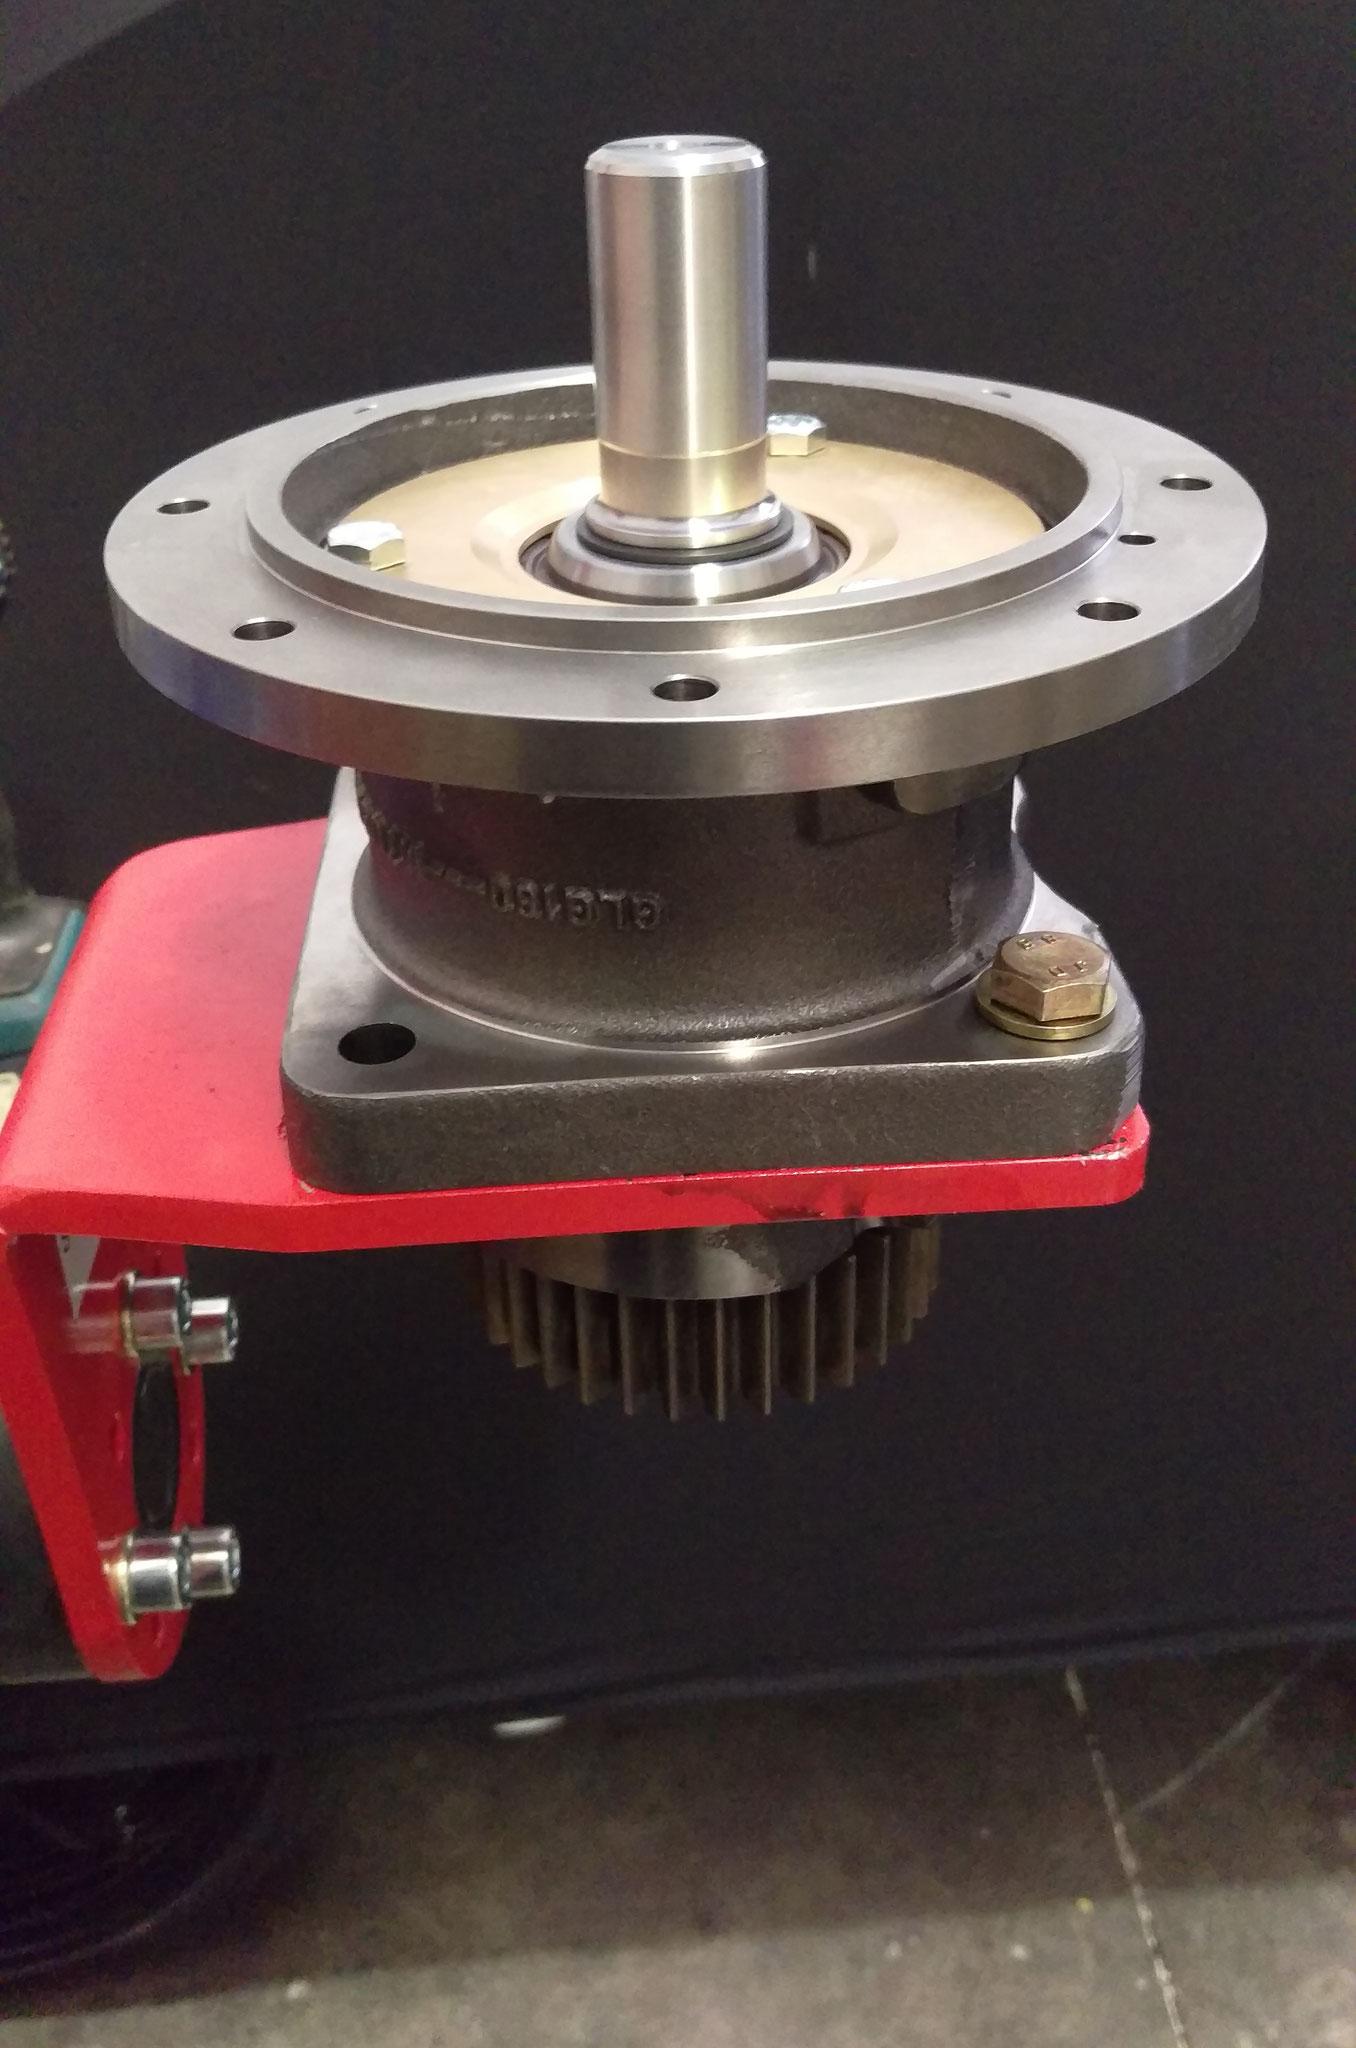 Coolant pump on swivel stand